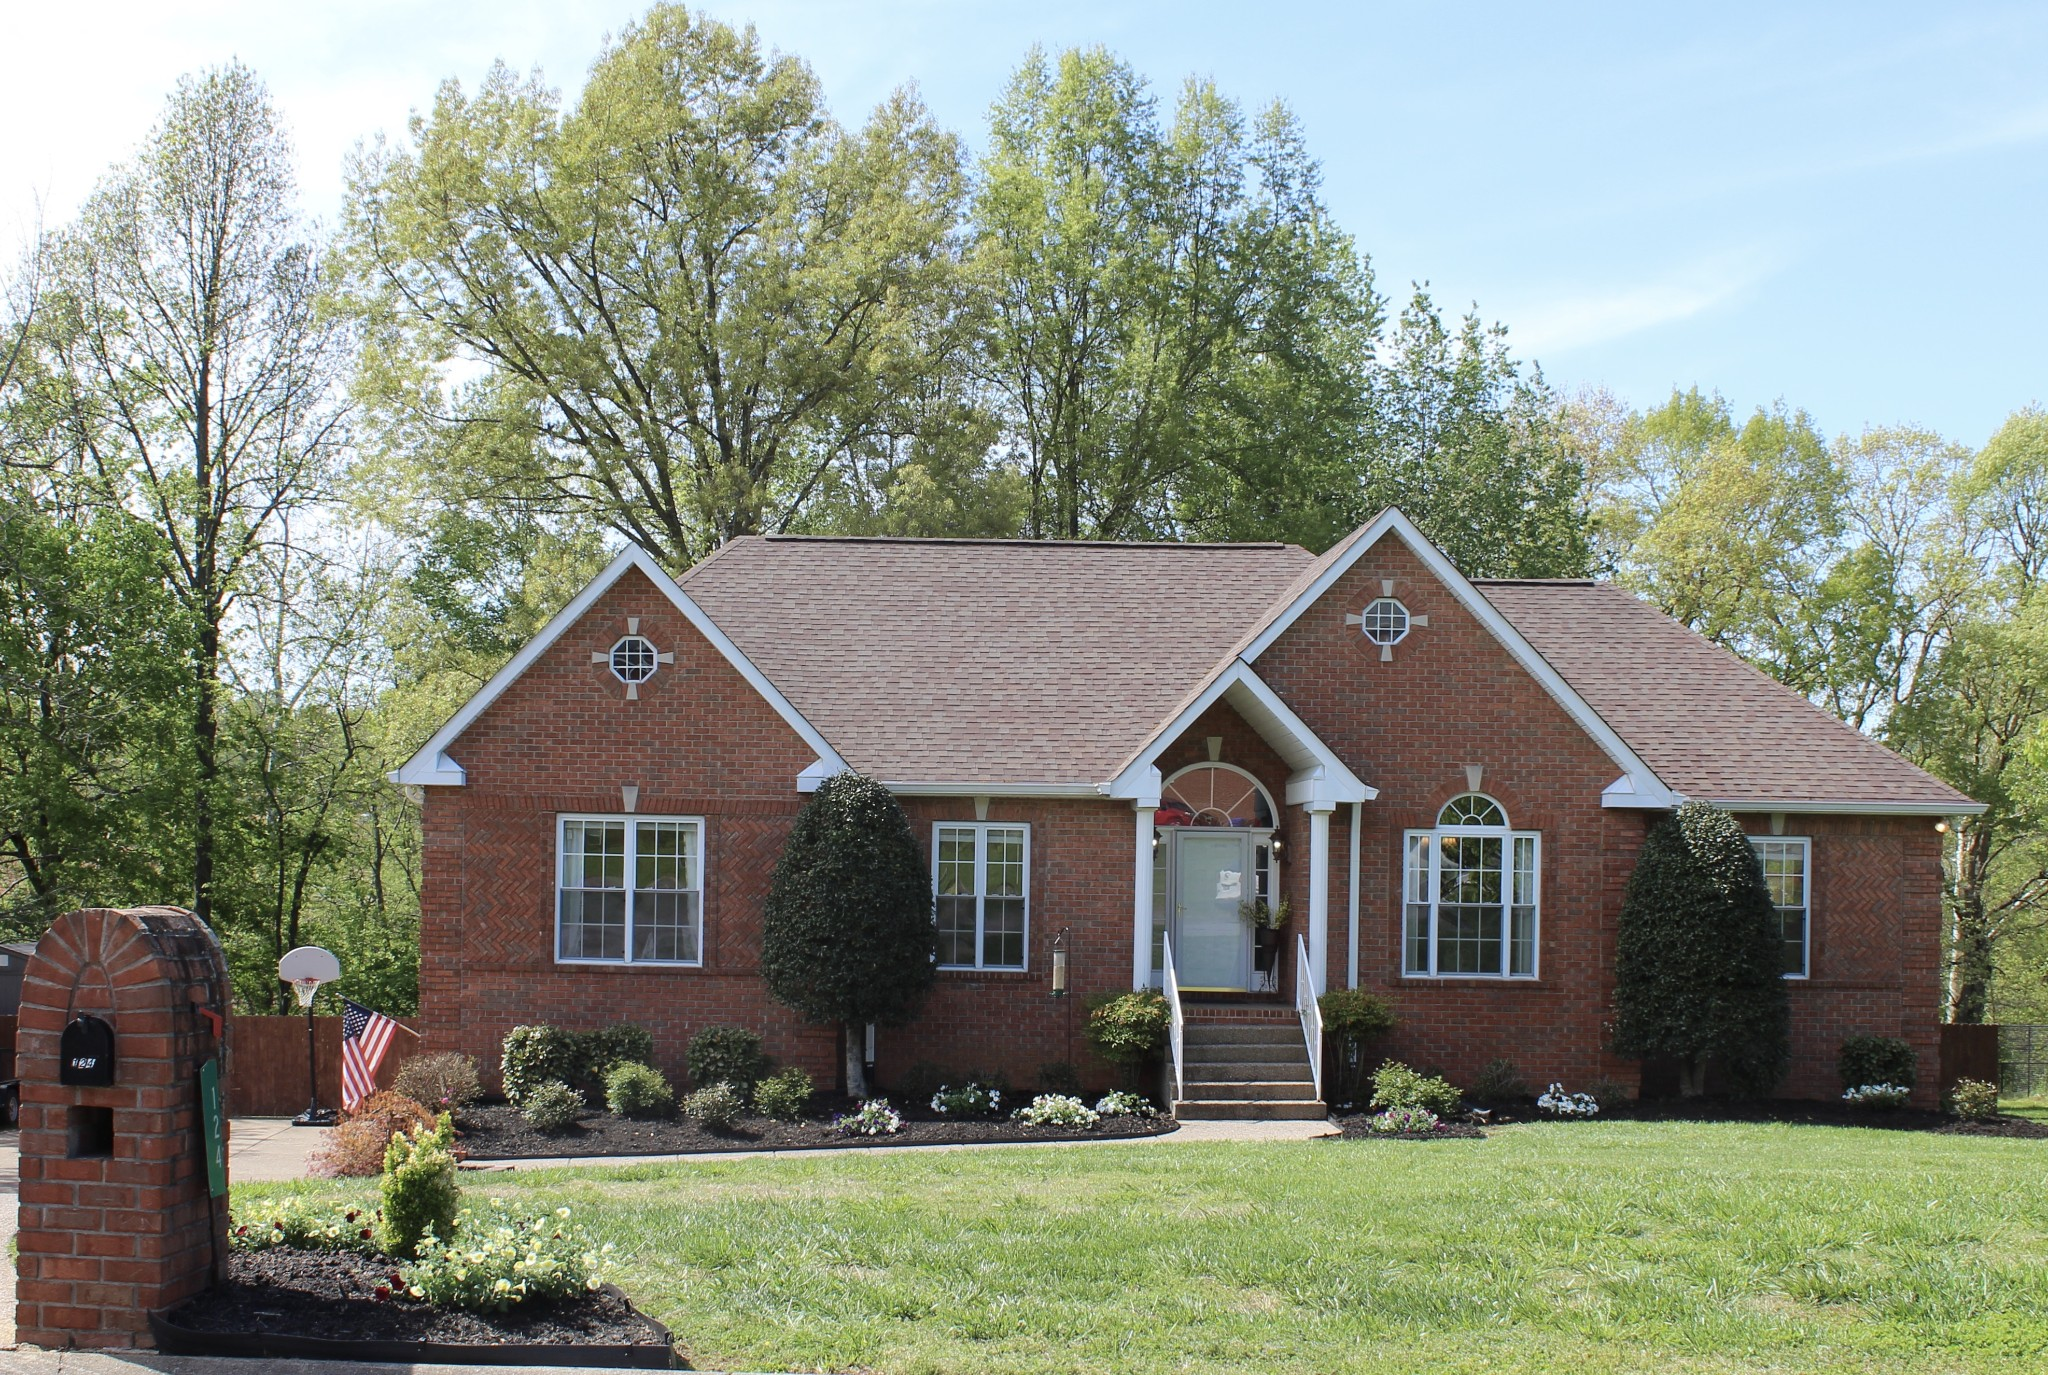 124 Covington Bnd, White House, TN 37188 - White House, TN real estate listing